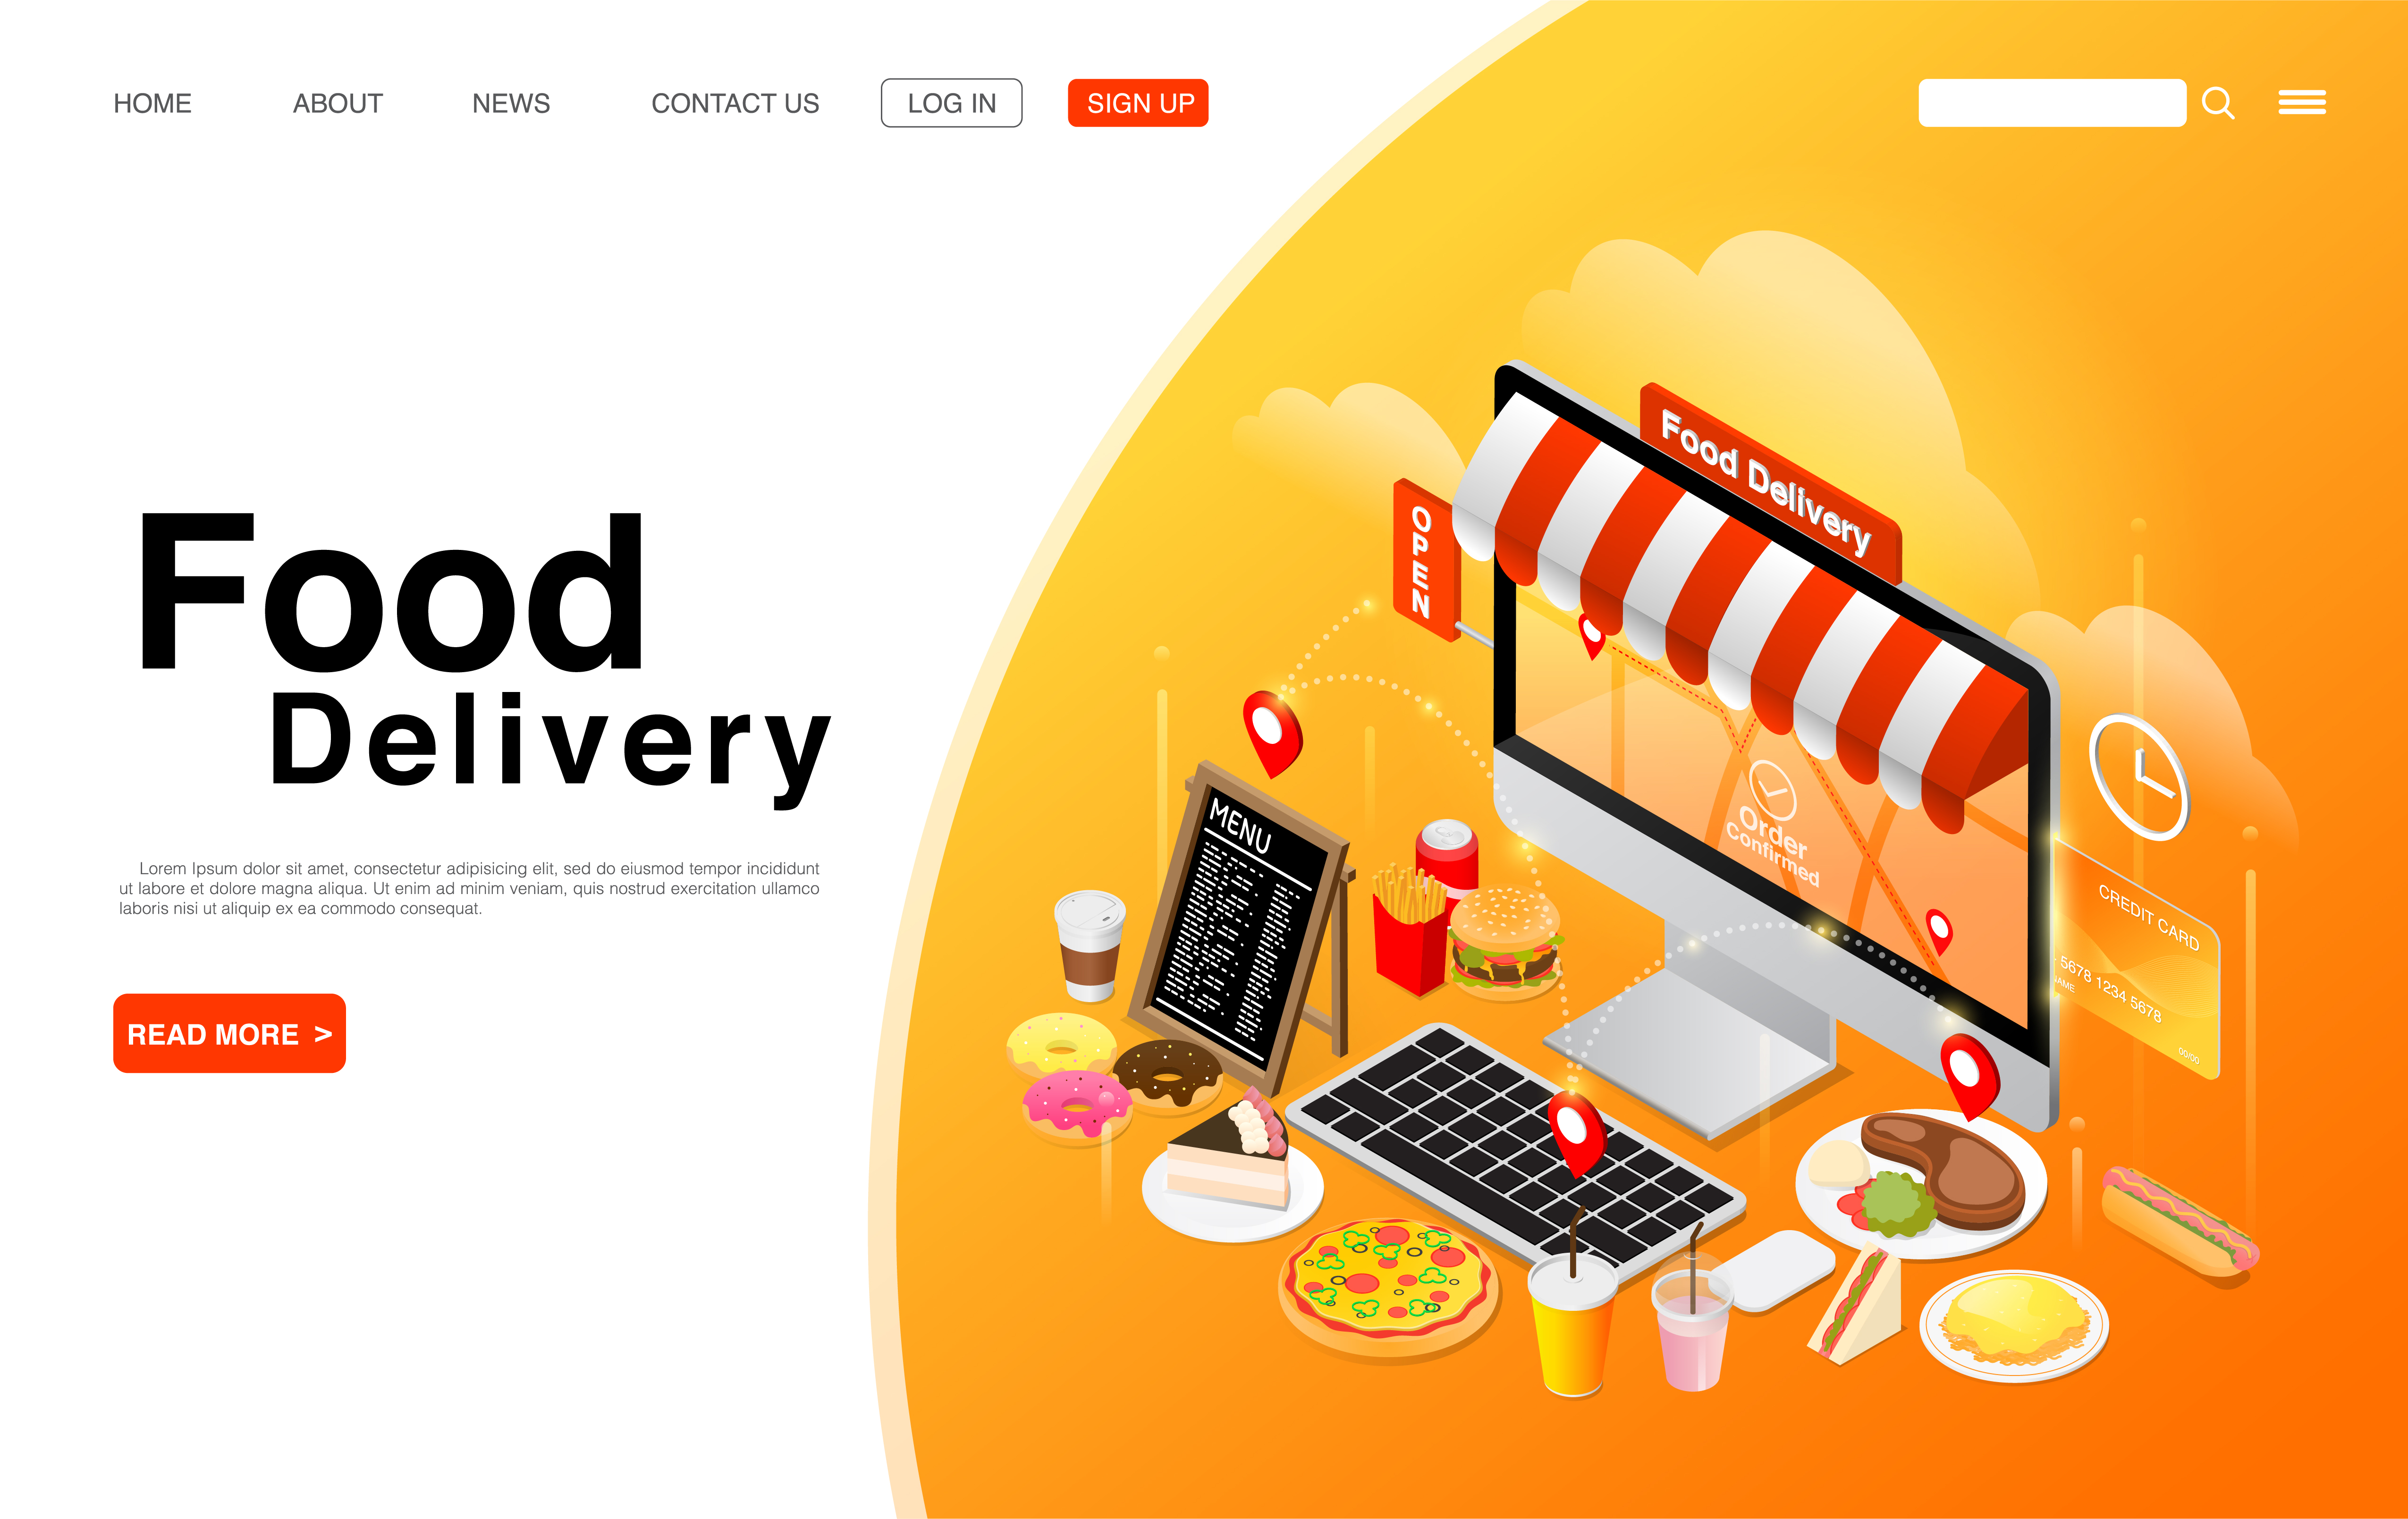 pedir comida online no computador desktop